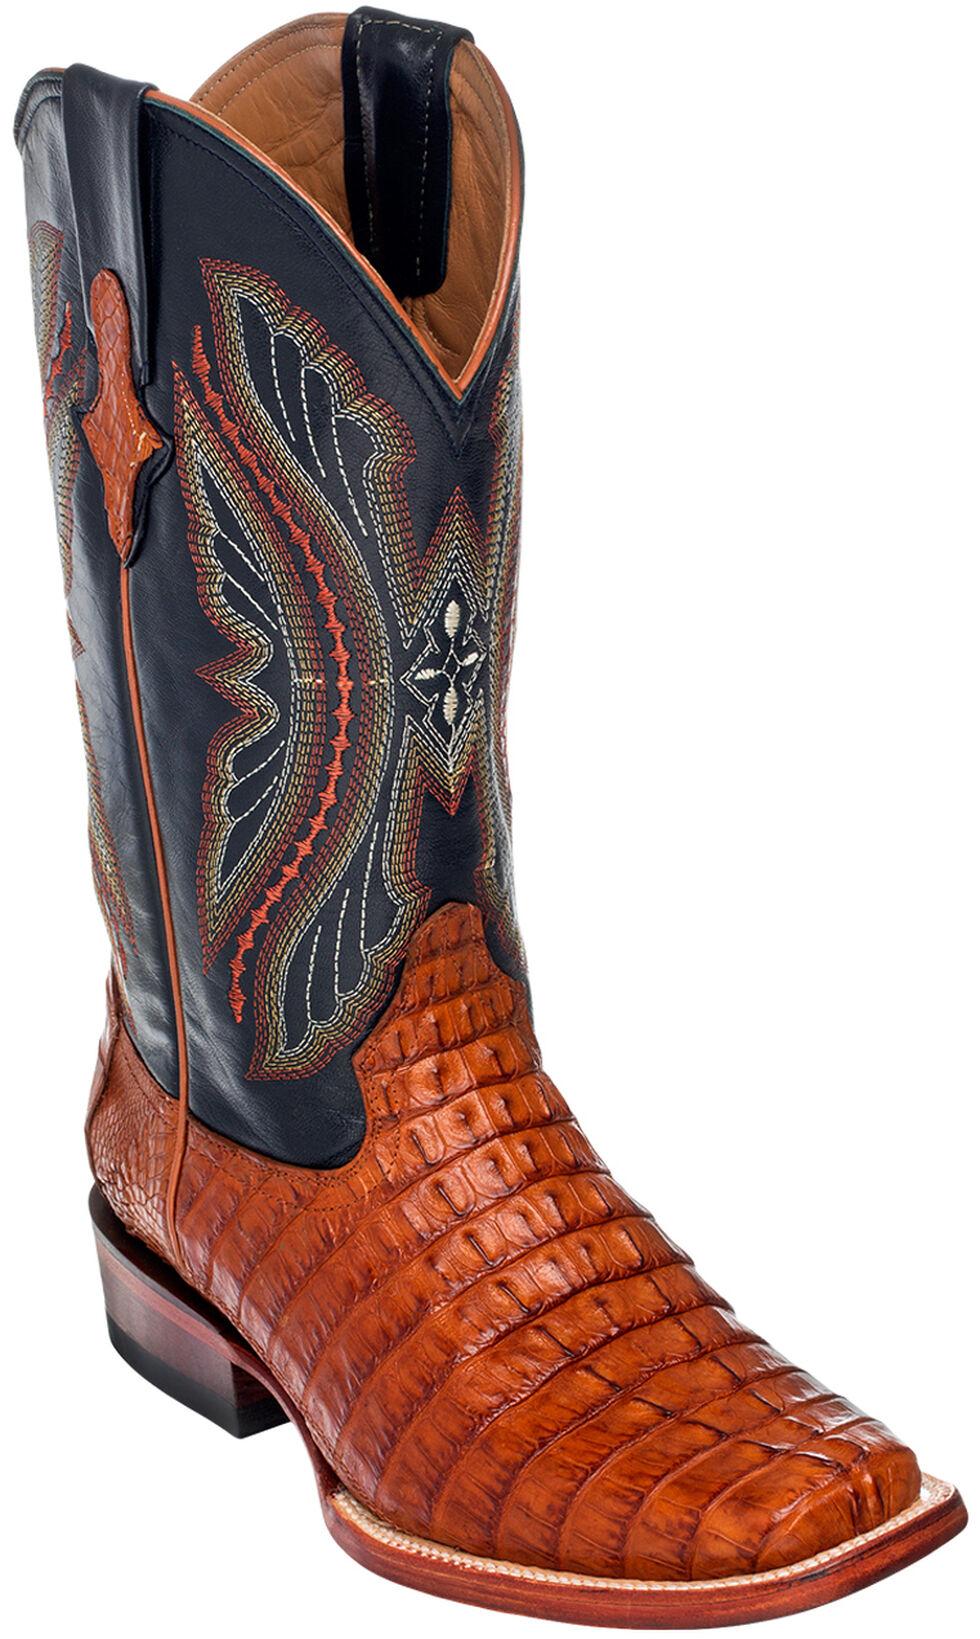 Ferrini Caiman Tail Exotic Cowboy Boots - Wide Square Toe, Cognac, hi-res